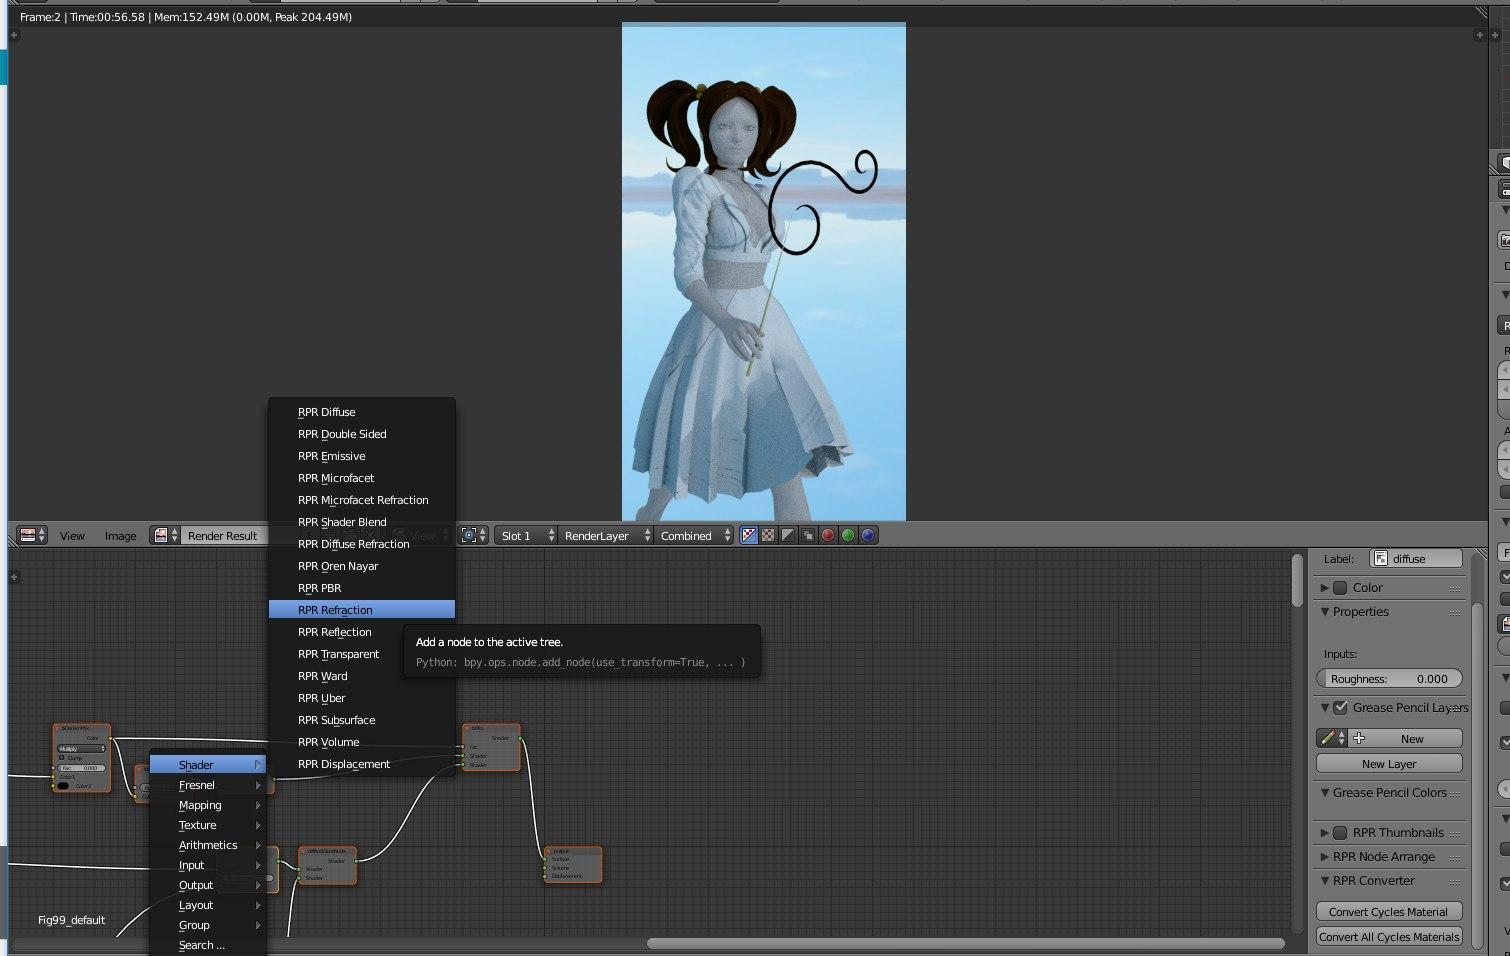 mcjTeleBlender:Daz Studio scenes/animations w/Blender's Cycles